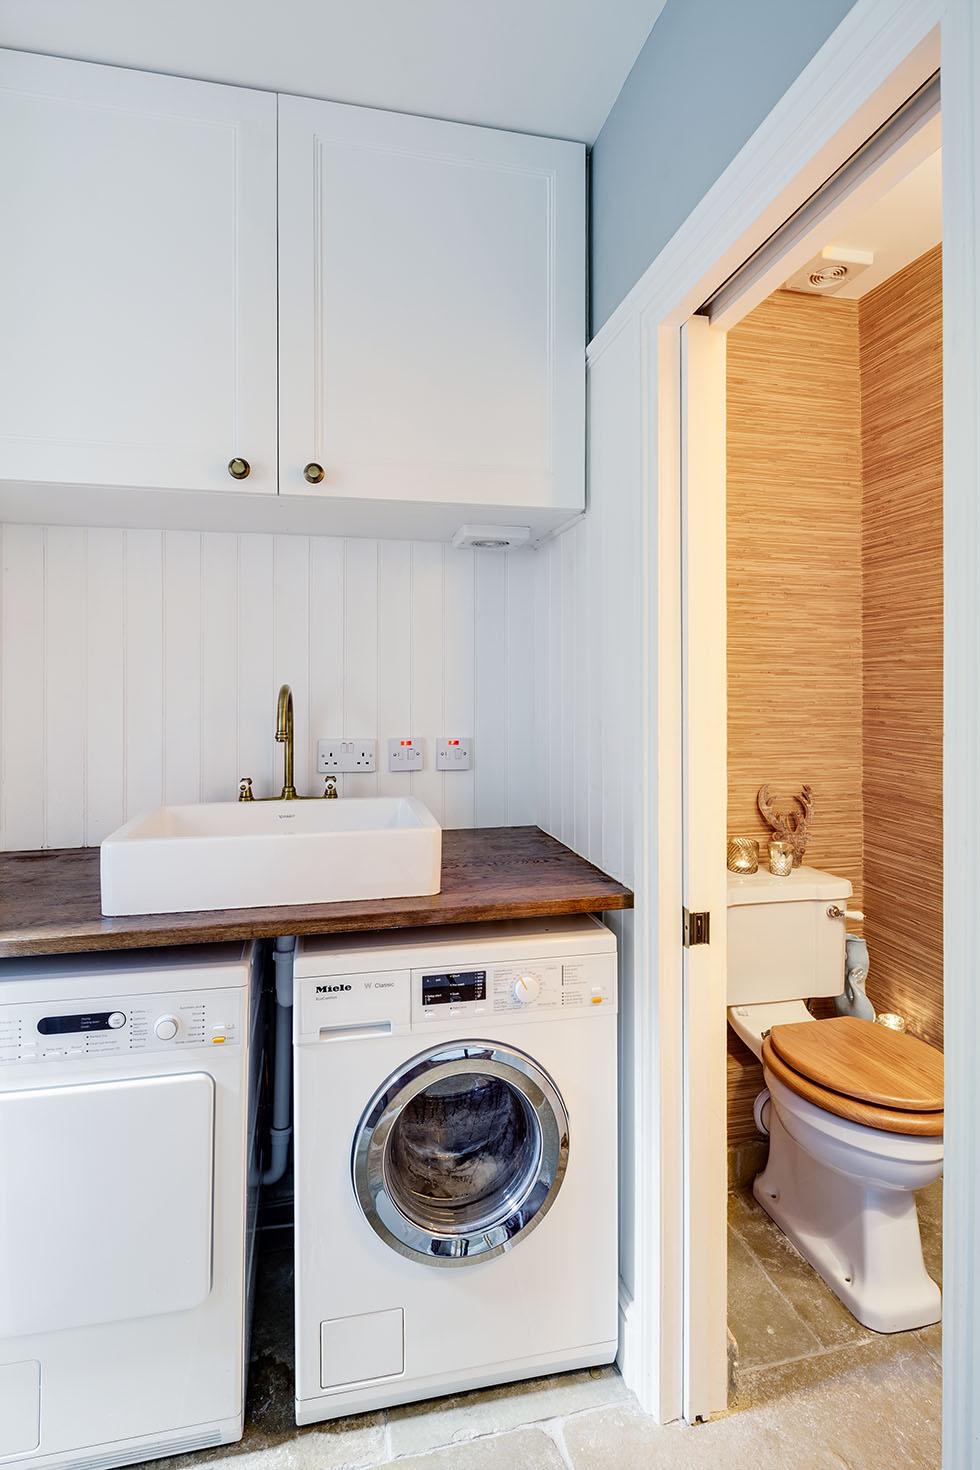 George Home Kitchen With Washing Machine Fridge